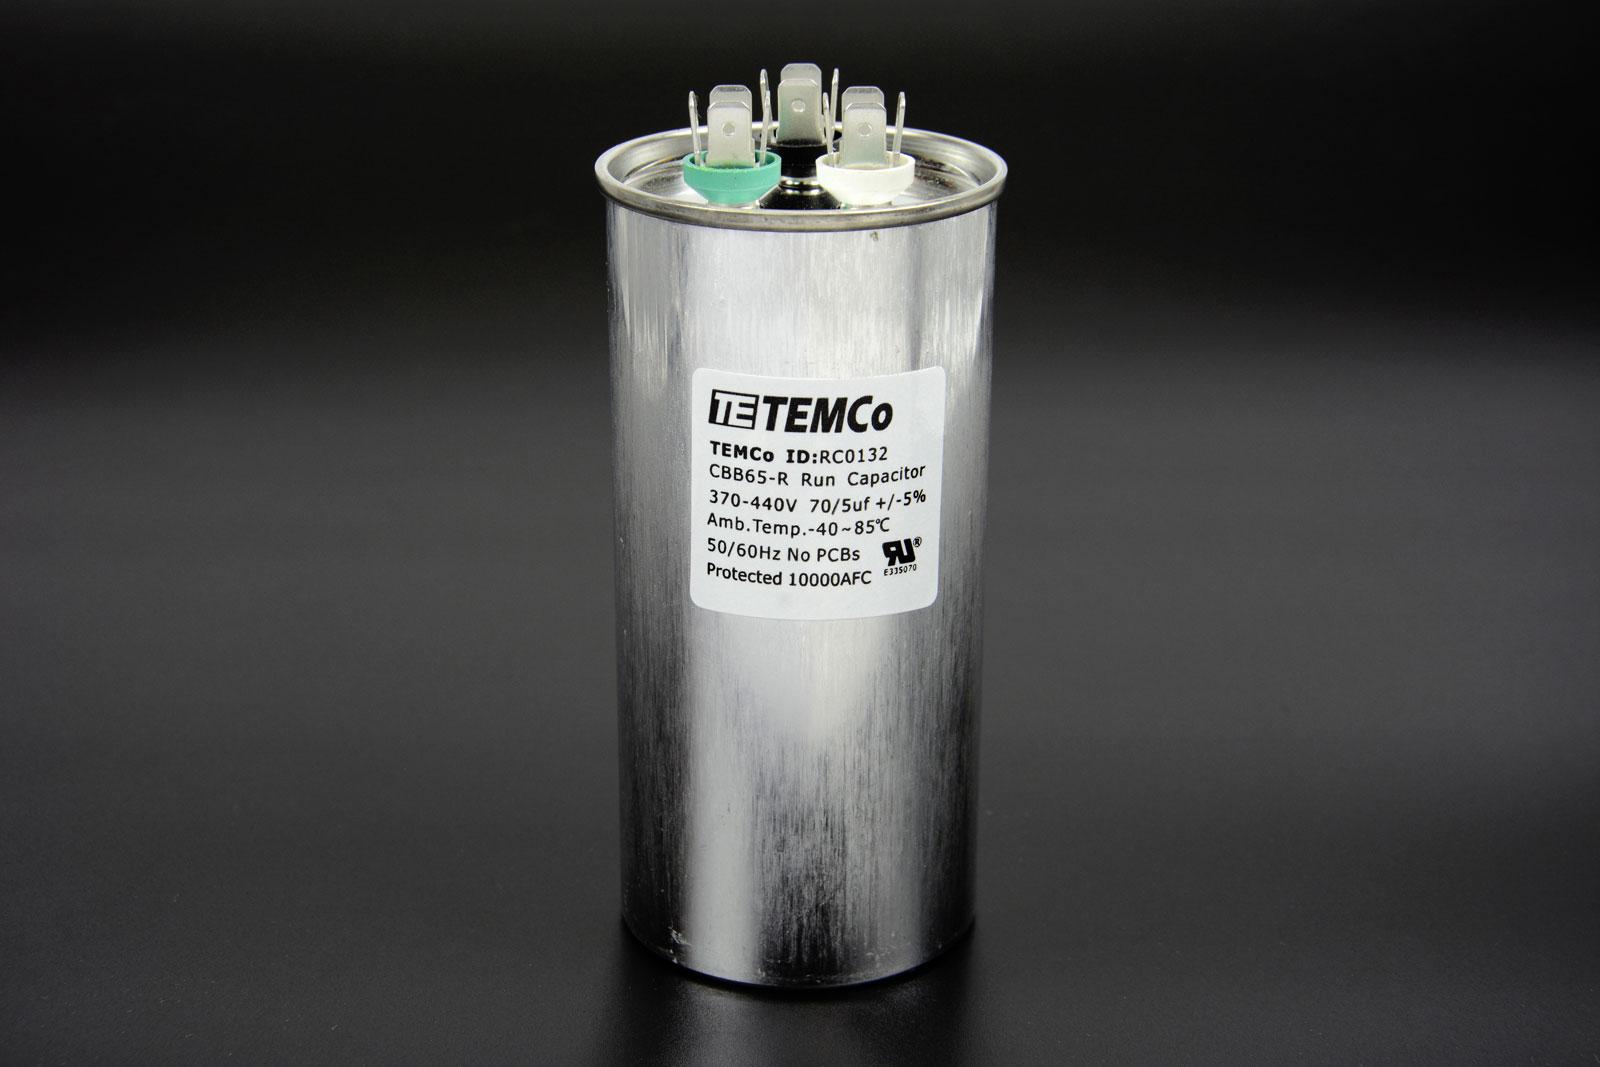 Temco 70 5 Mfd Uf Dual Run Capacitor 370 440 Vac Volts Ac